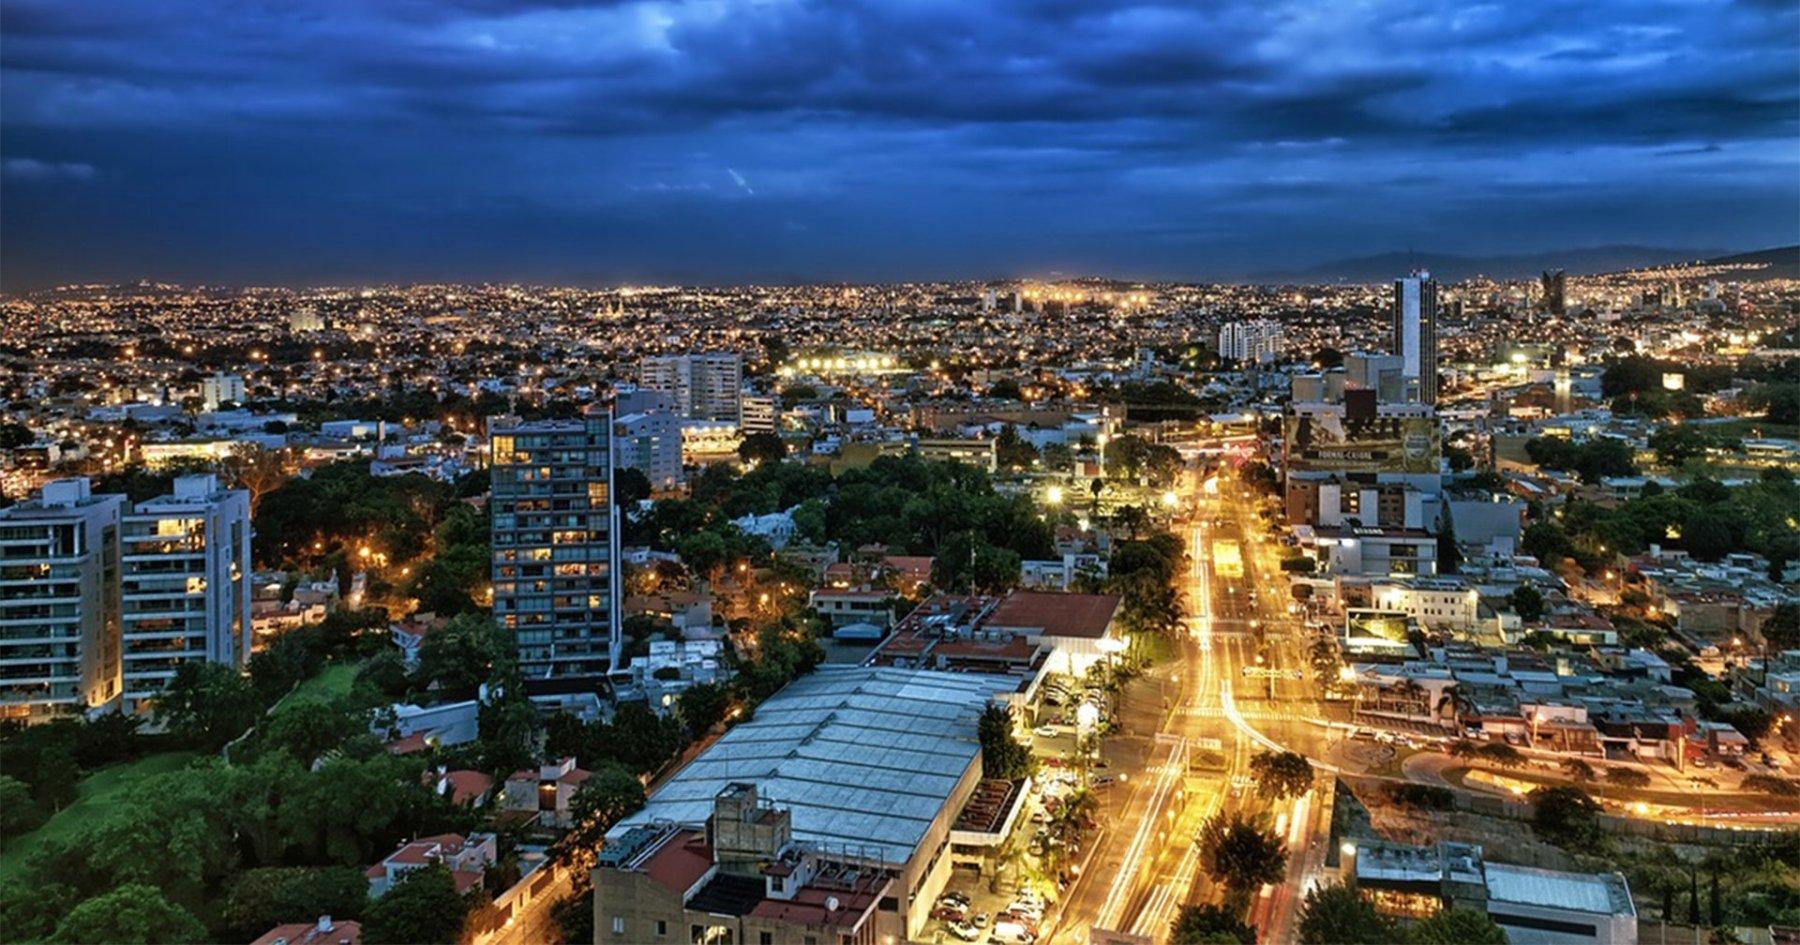 Guadalajara: Land of Tequila, Cemeteries and Restaurants Made of Bones